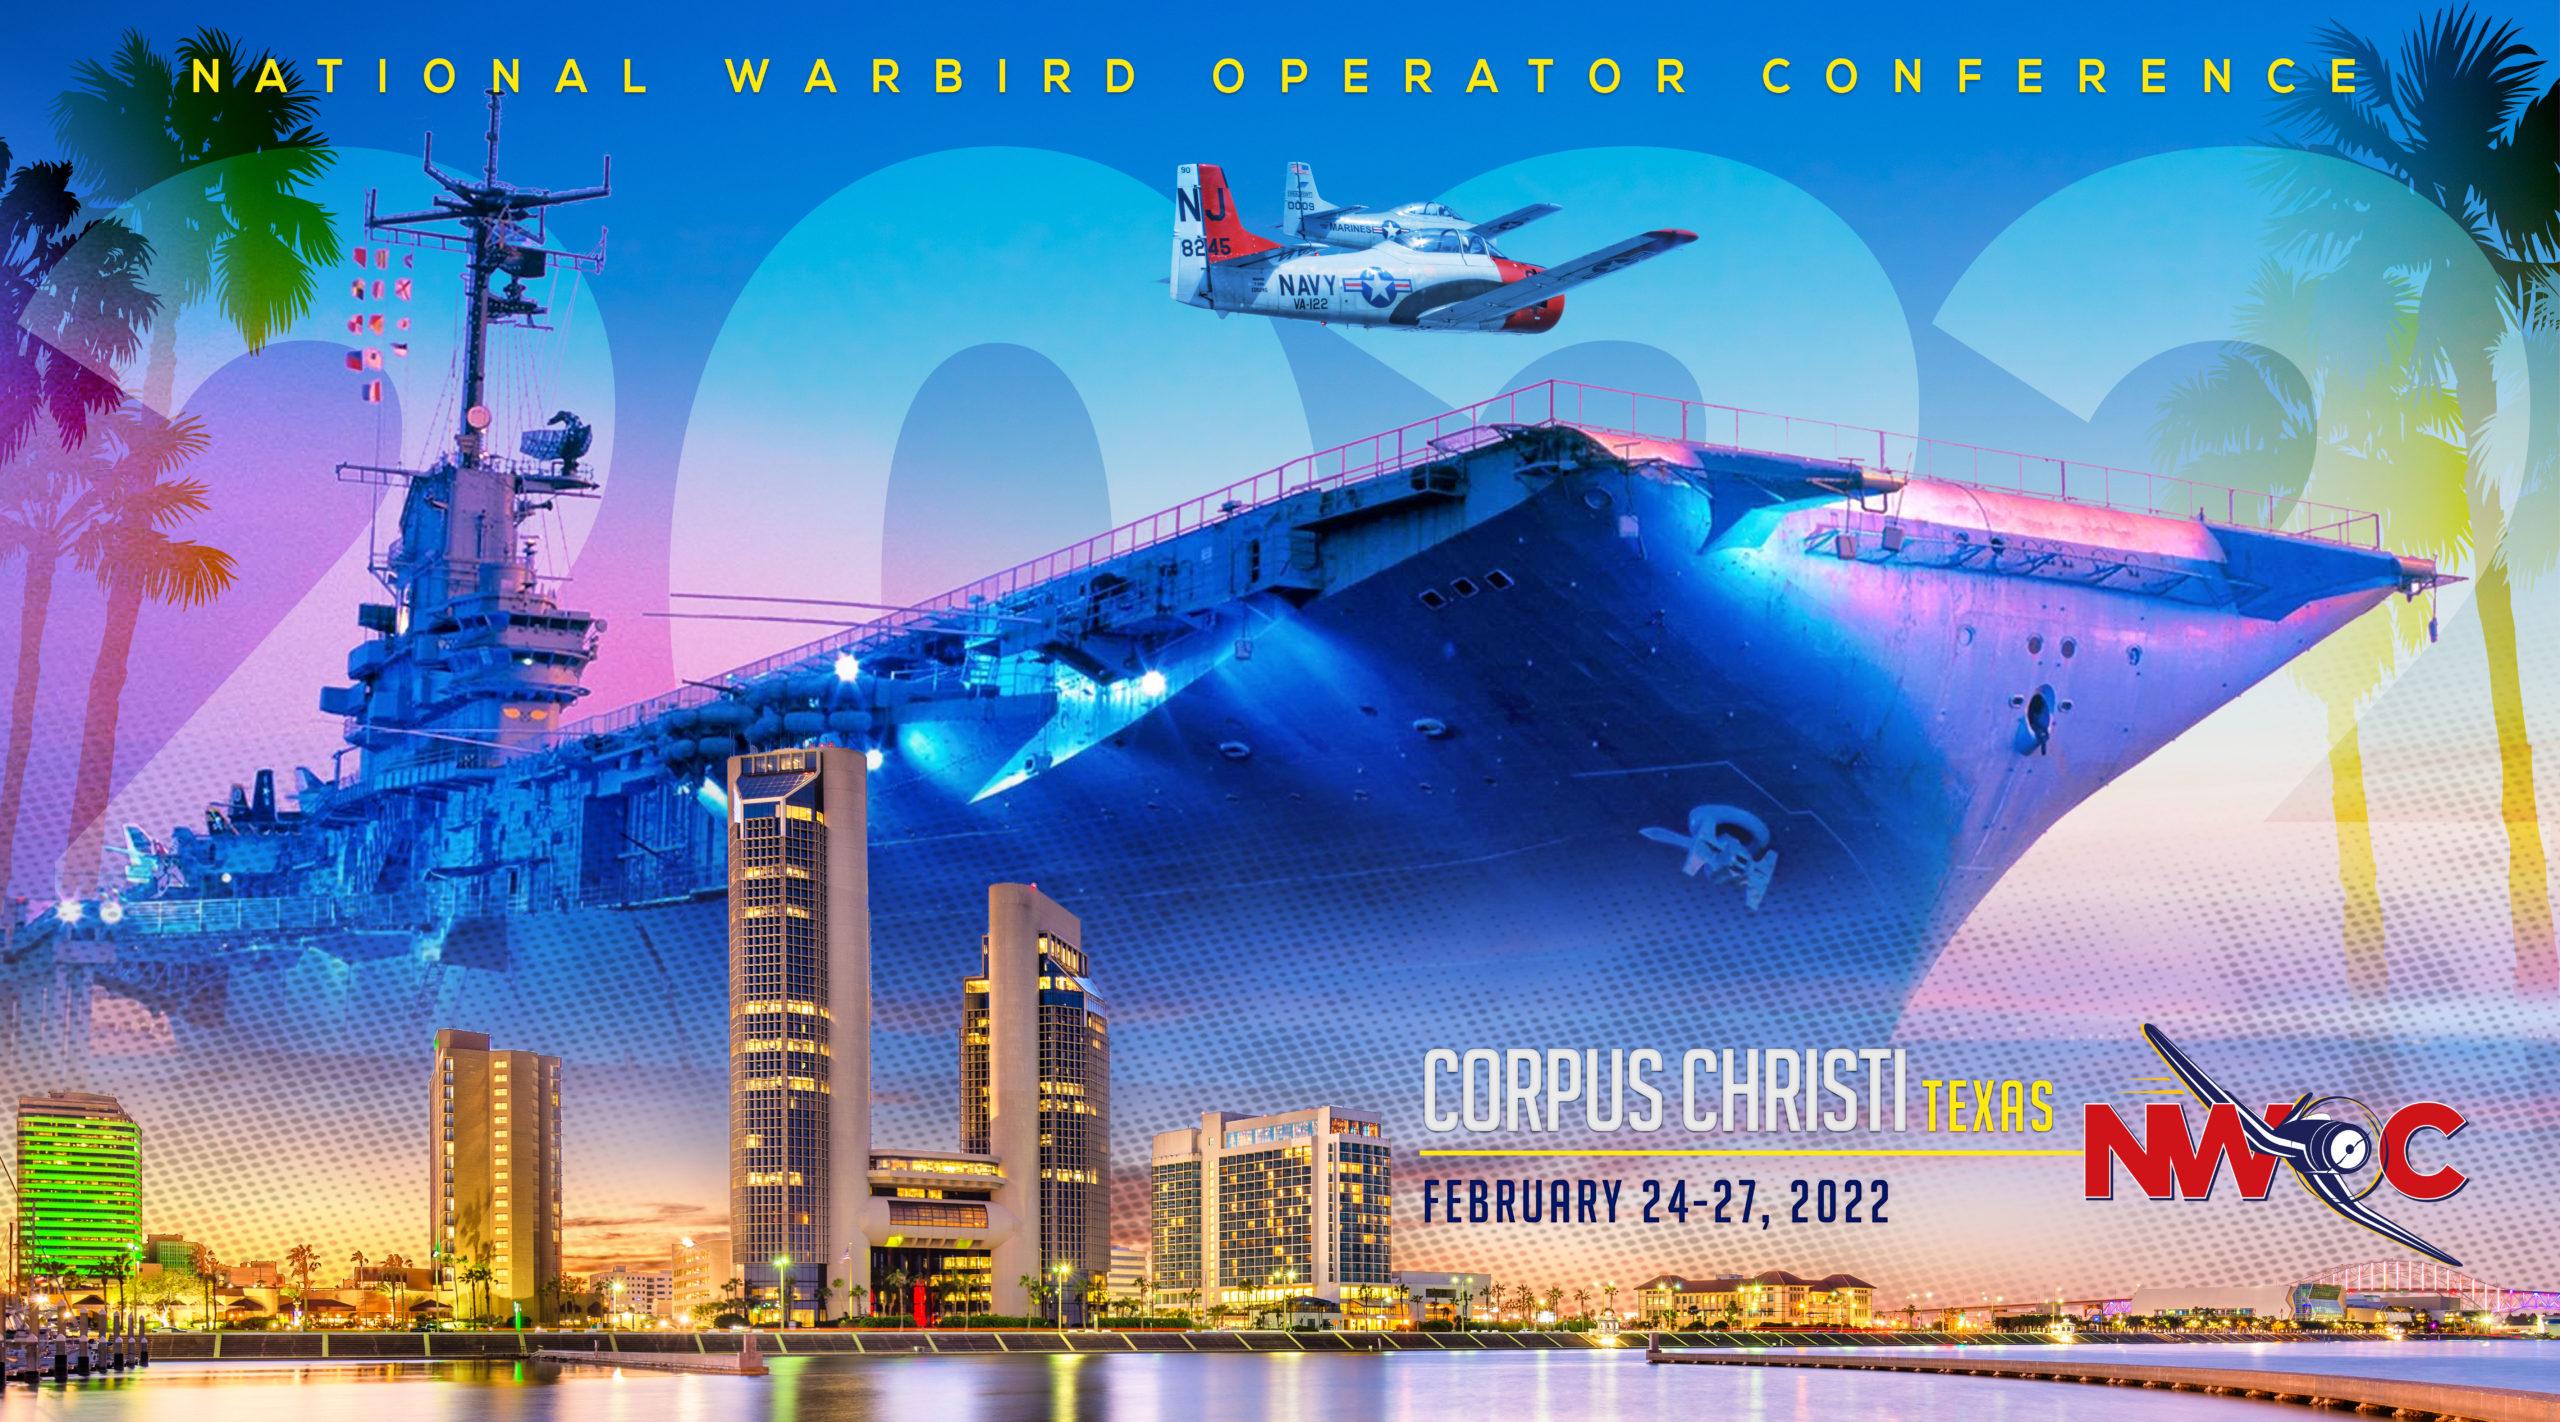 NWOC 2022 Corpus Christi 20x36 poster